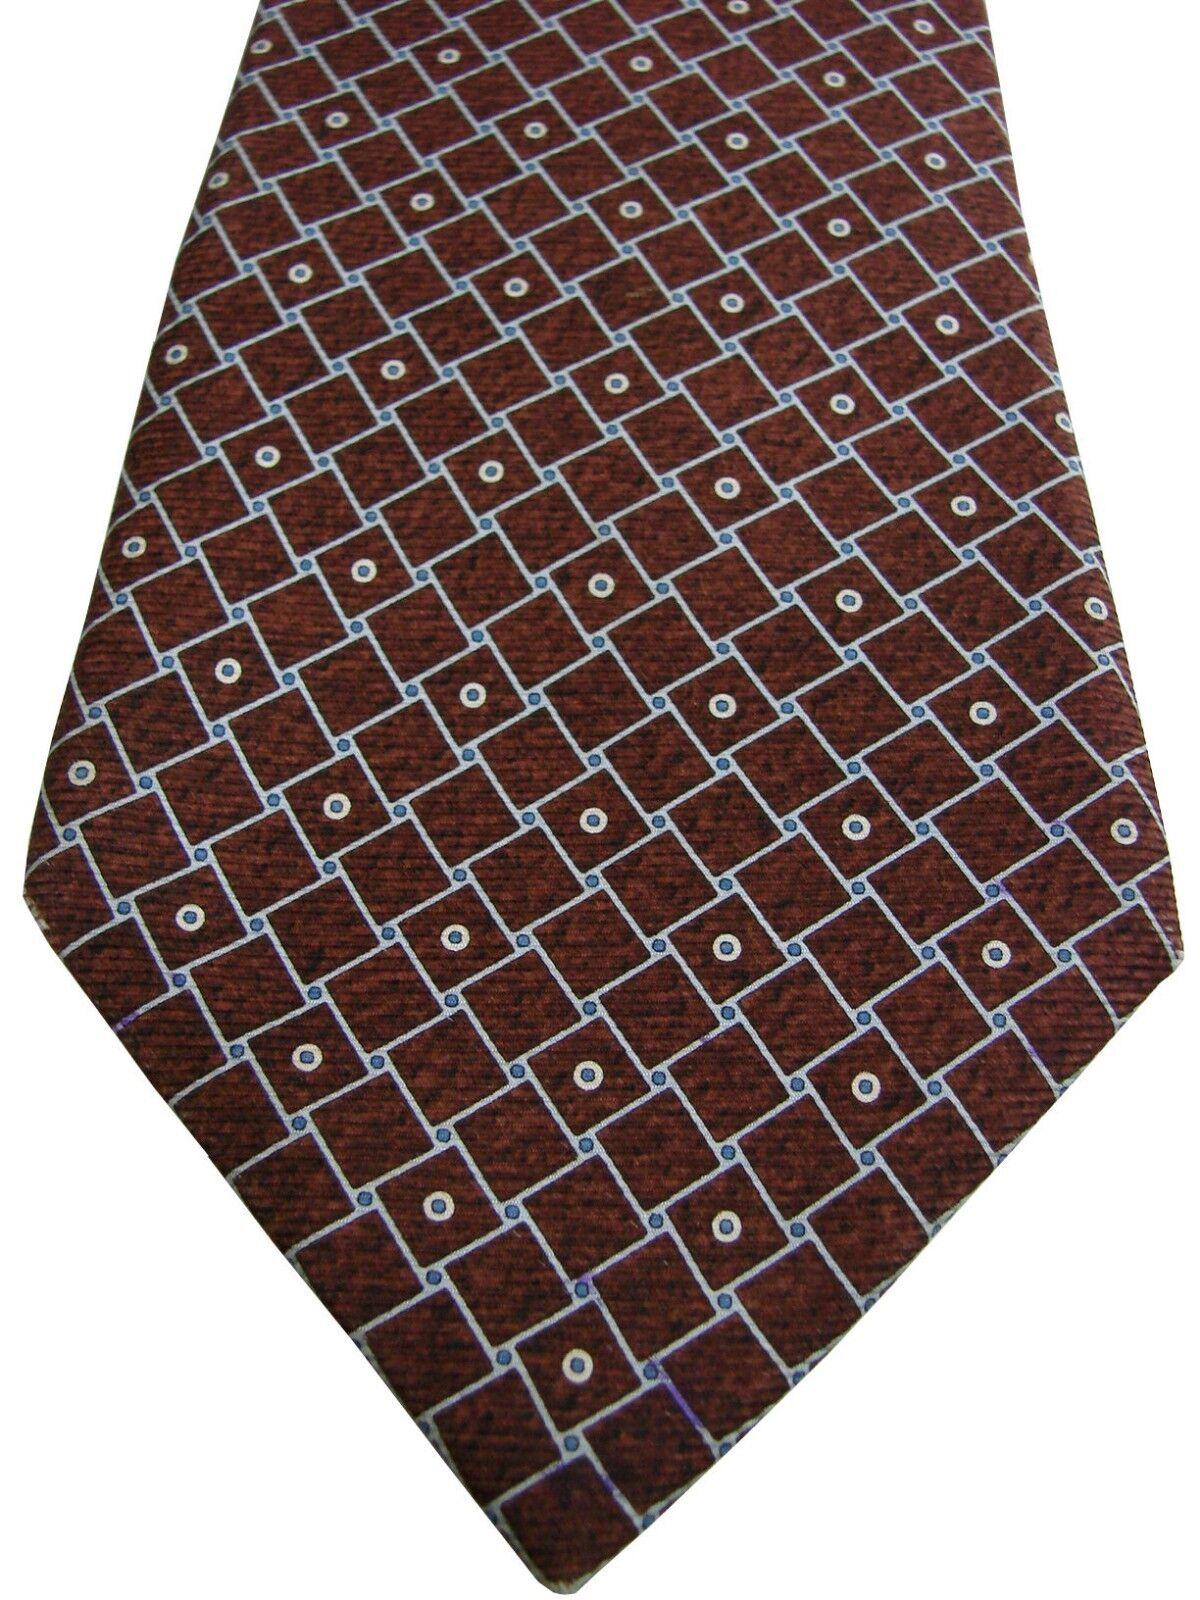 BVLGARI - SEVENFOLD Tie braun - Squares | Elegante Elegante Elegante und robuste Verpackung  425590